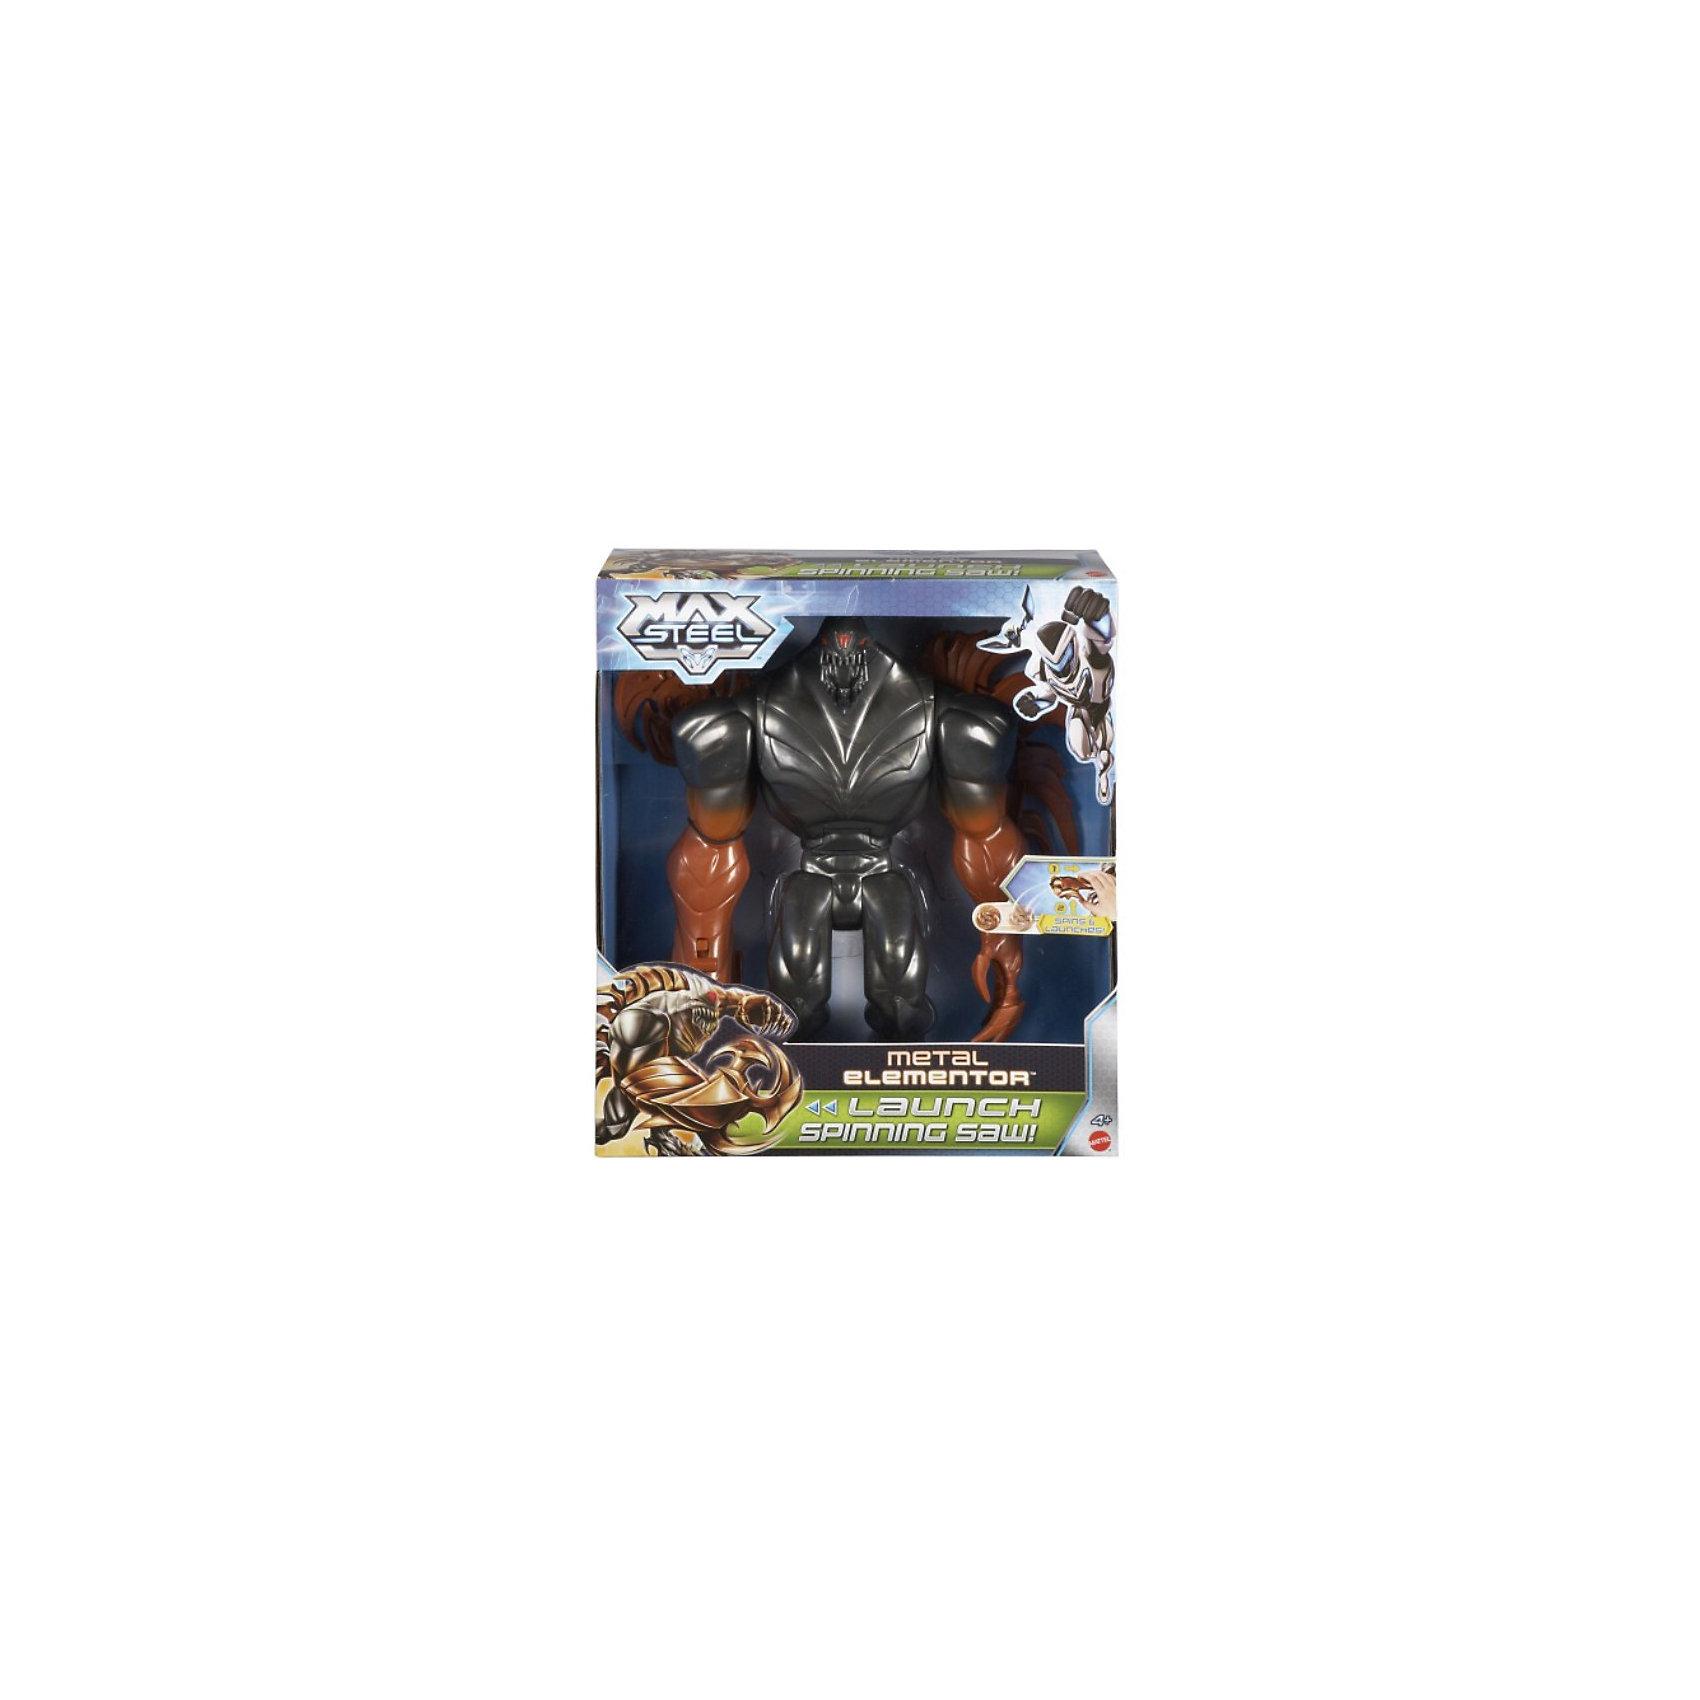 ������� Metal Elementor, Max Steel (Mattel)